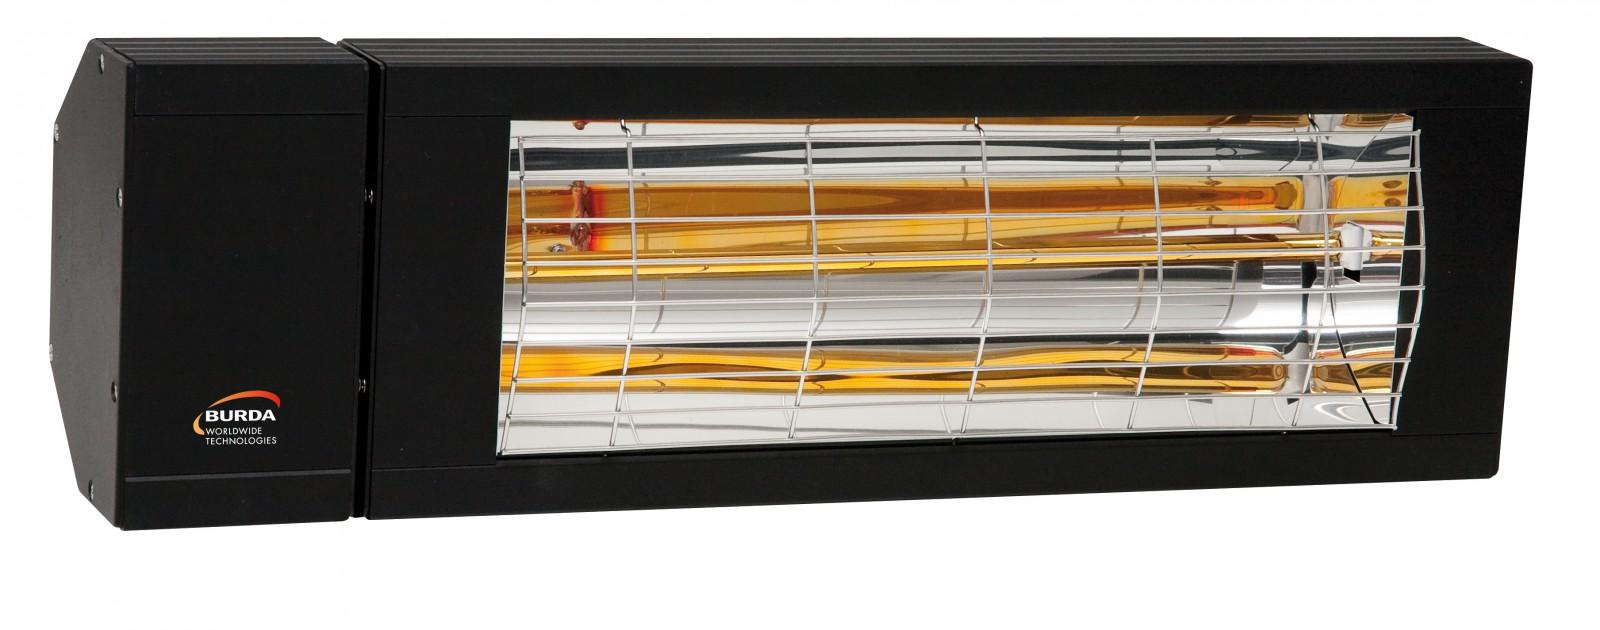 infrarot heizstrahler burda smart ip24 2000 watt w rmeleistung in verschiedenen farben. Black Bedroom Furniture Sets. Home Design Ideas